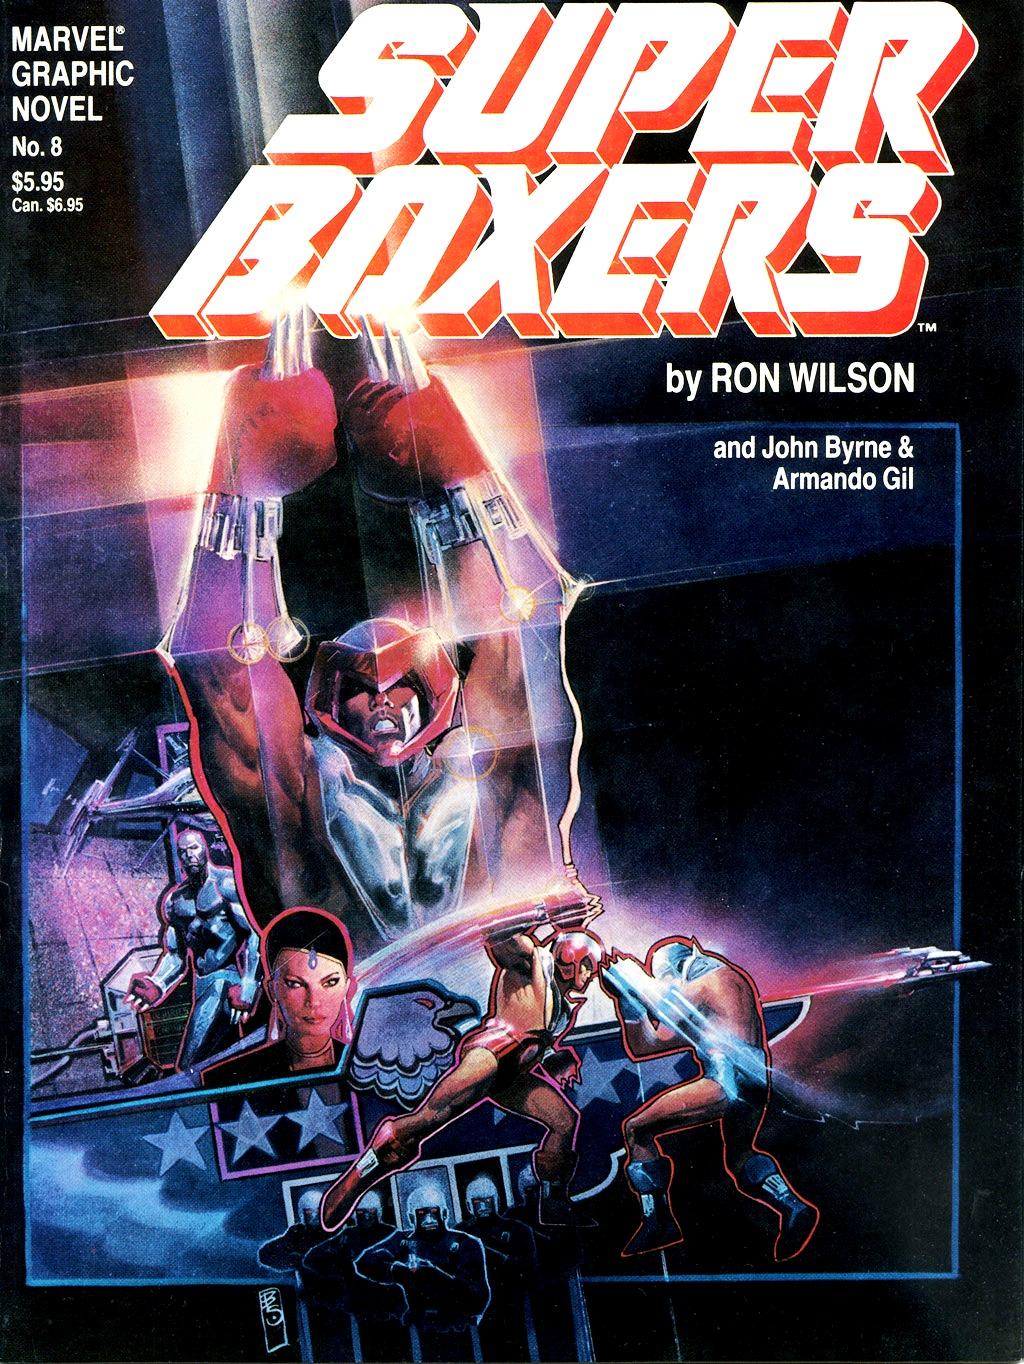 Marvel Graphic Novel 8_-_Super_Boxers Page 1